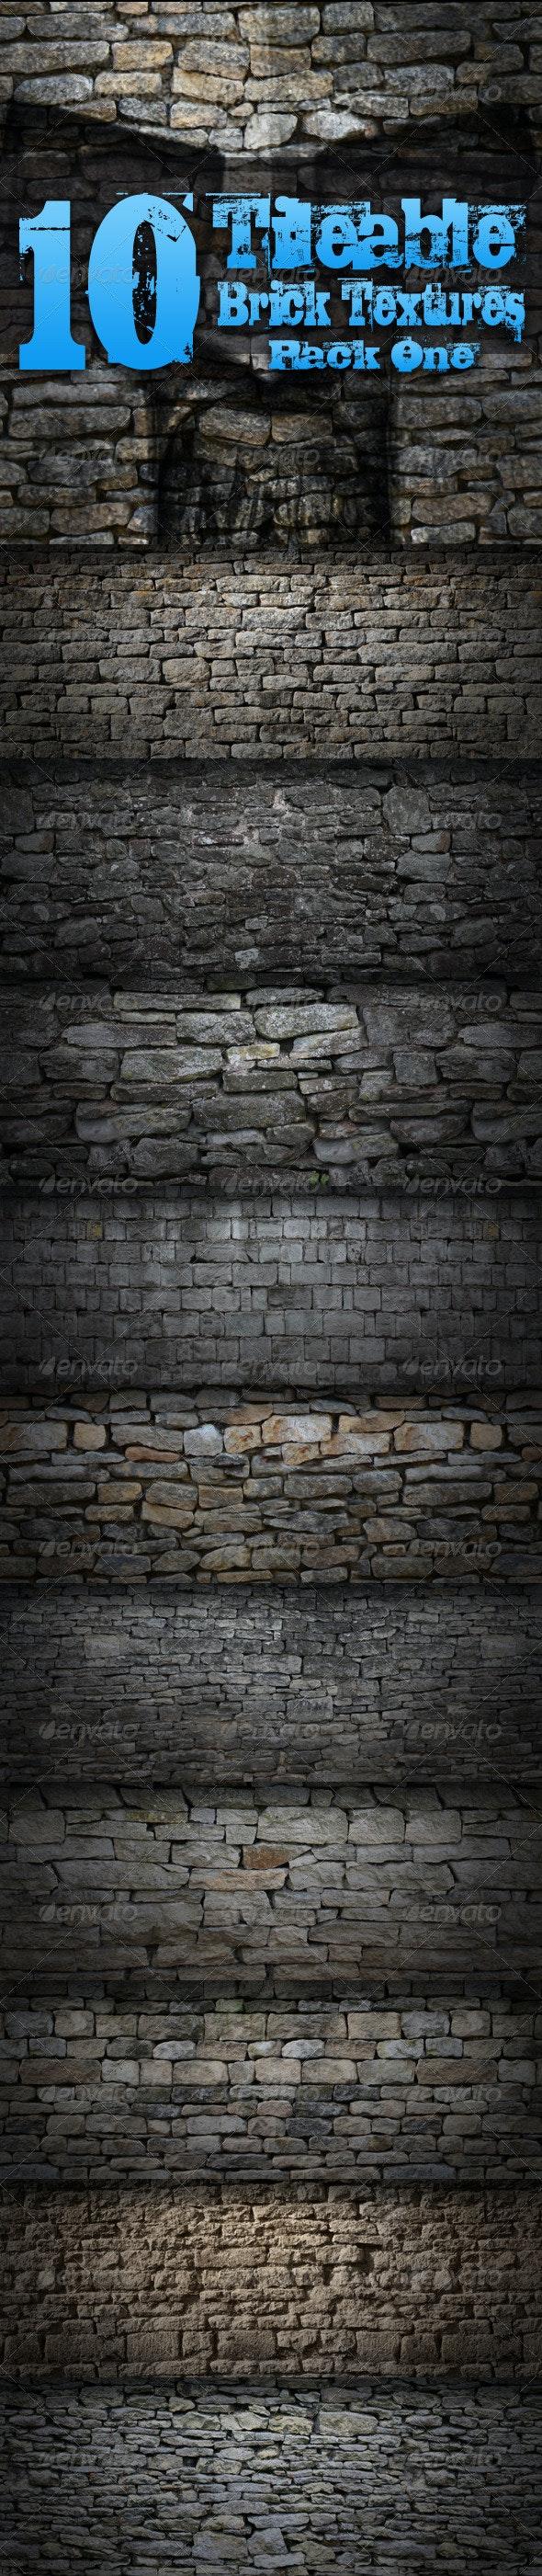 10 Tileable Brick Textures - Pack One - Miscellaneous Textures